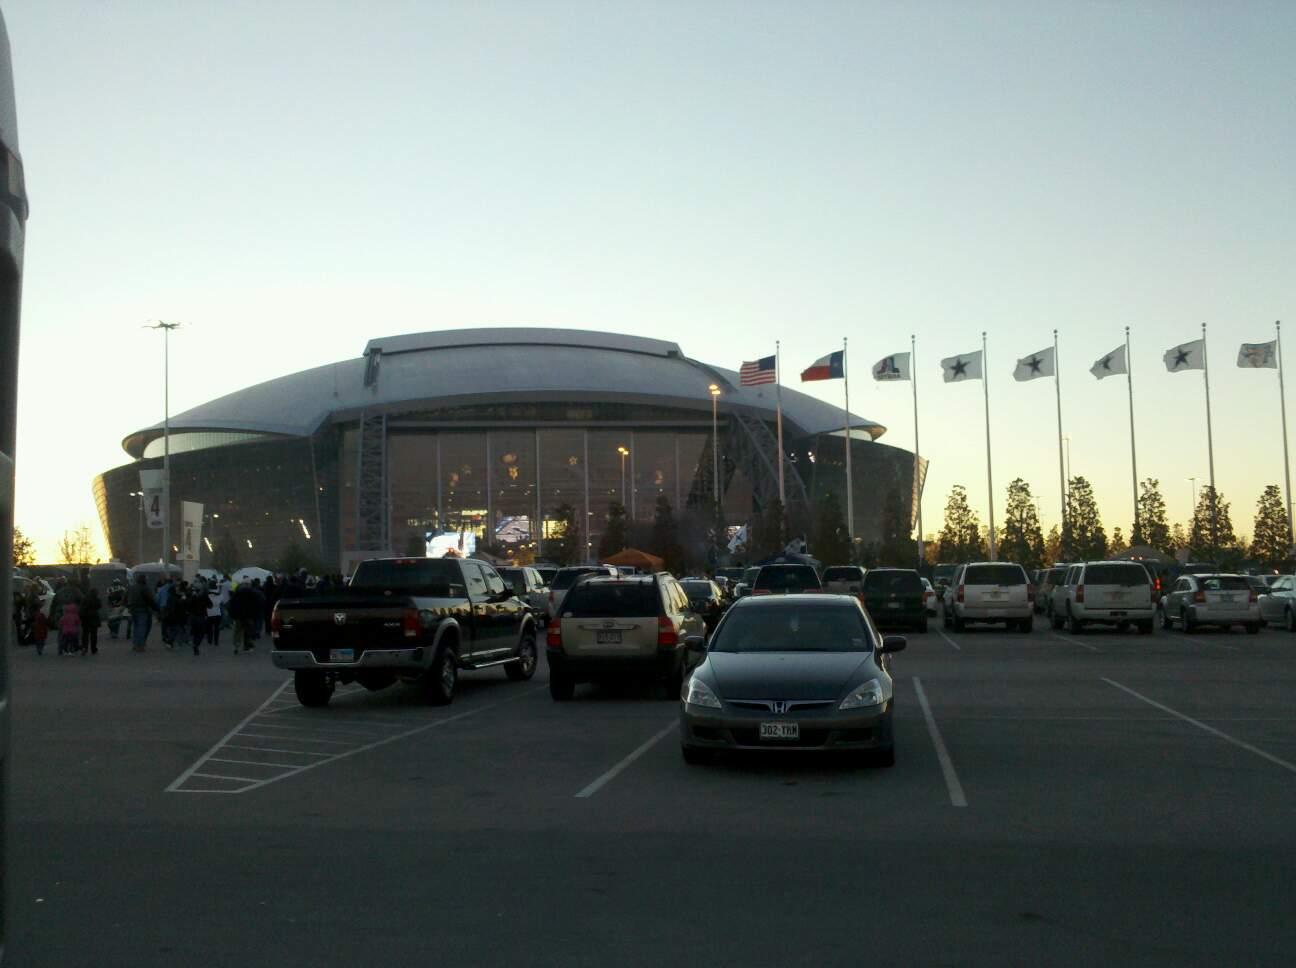 AT&T Stadium Secção Entry C